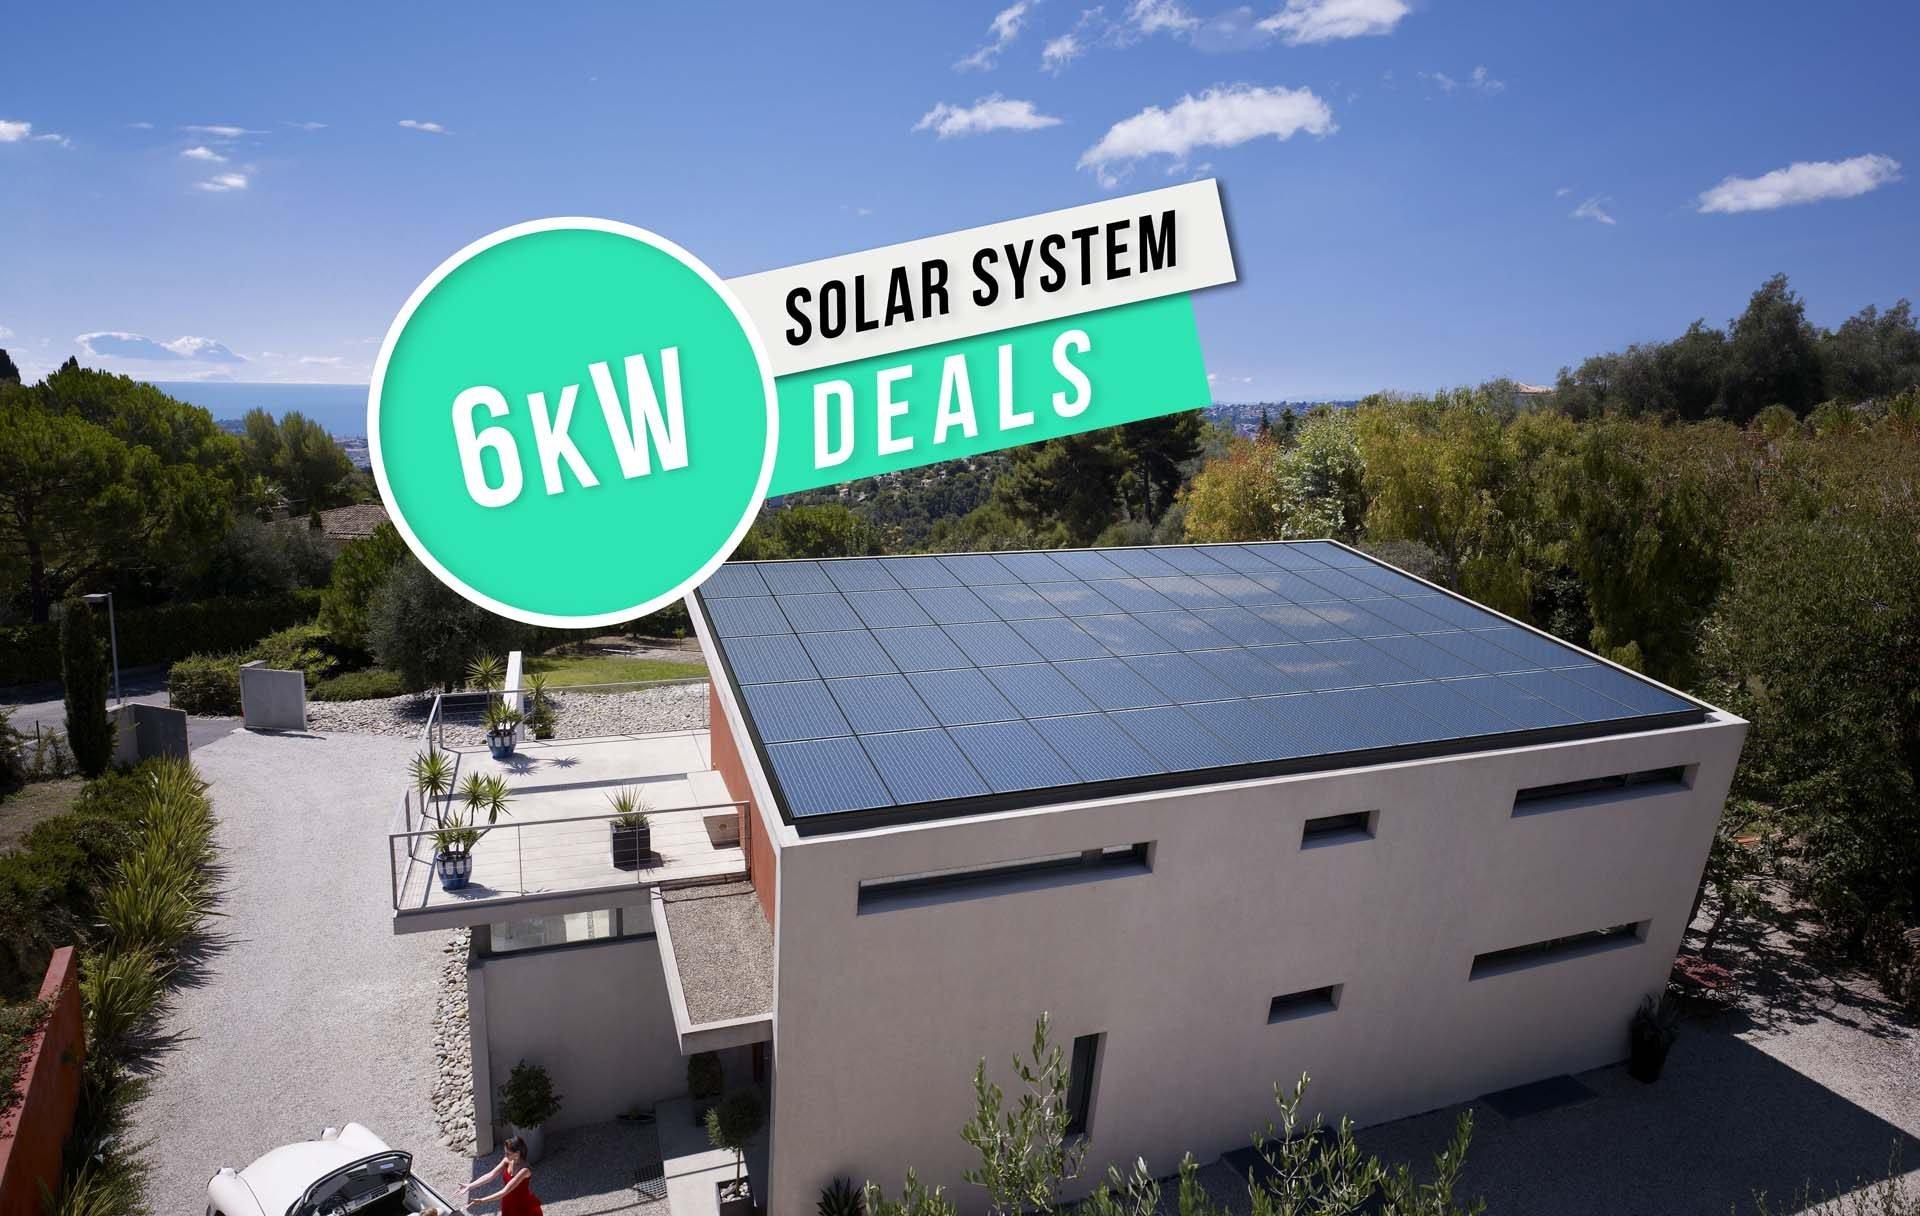 6kW Solar System Deals